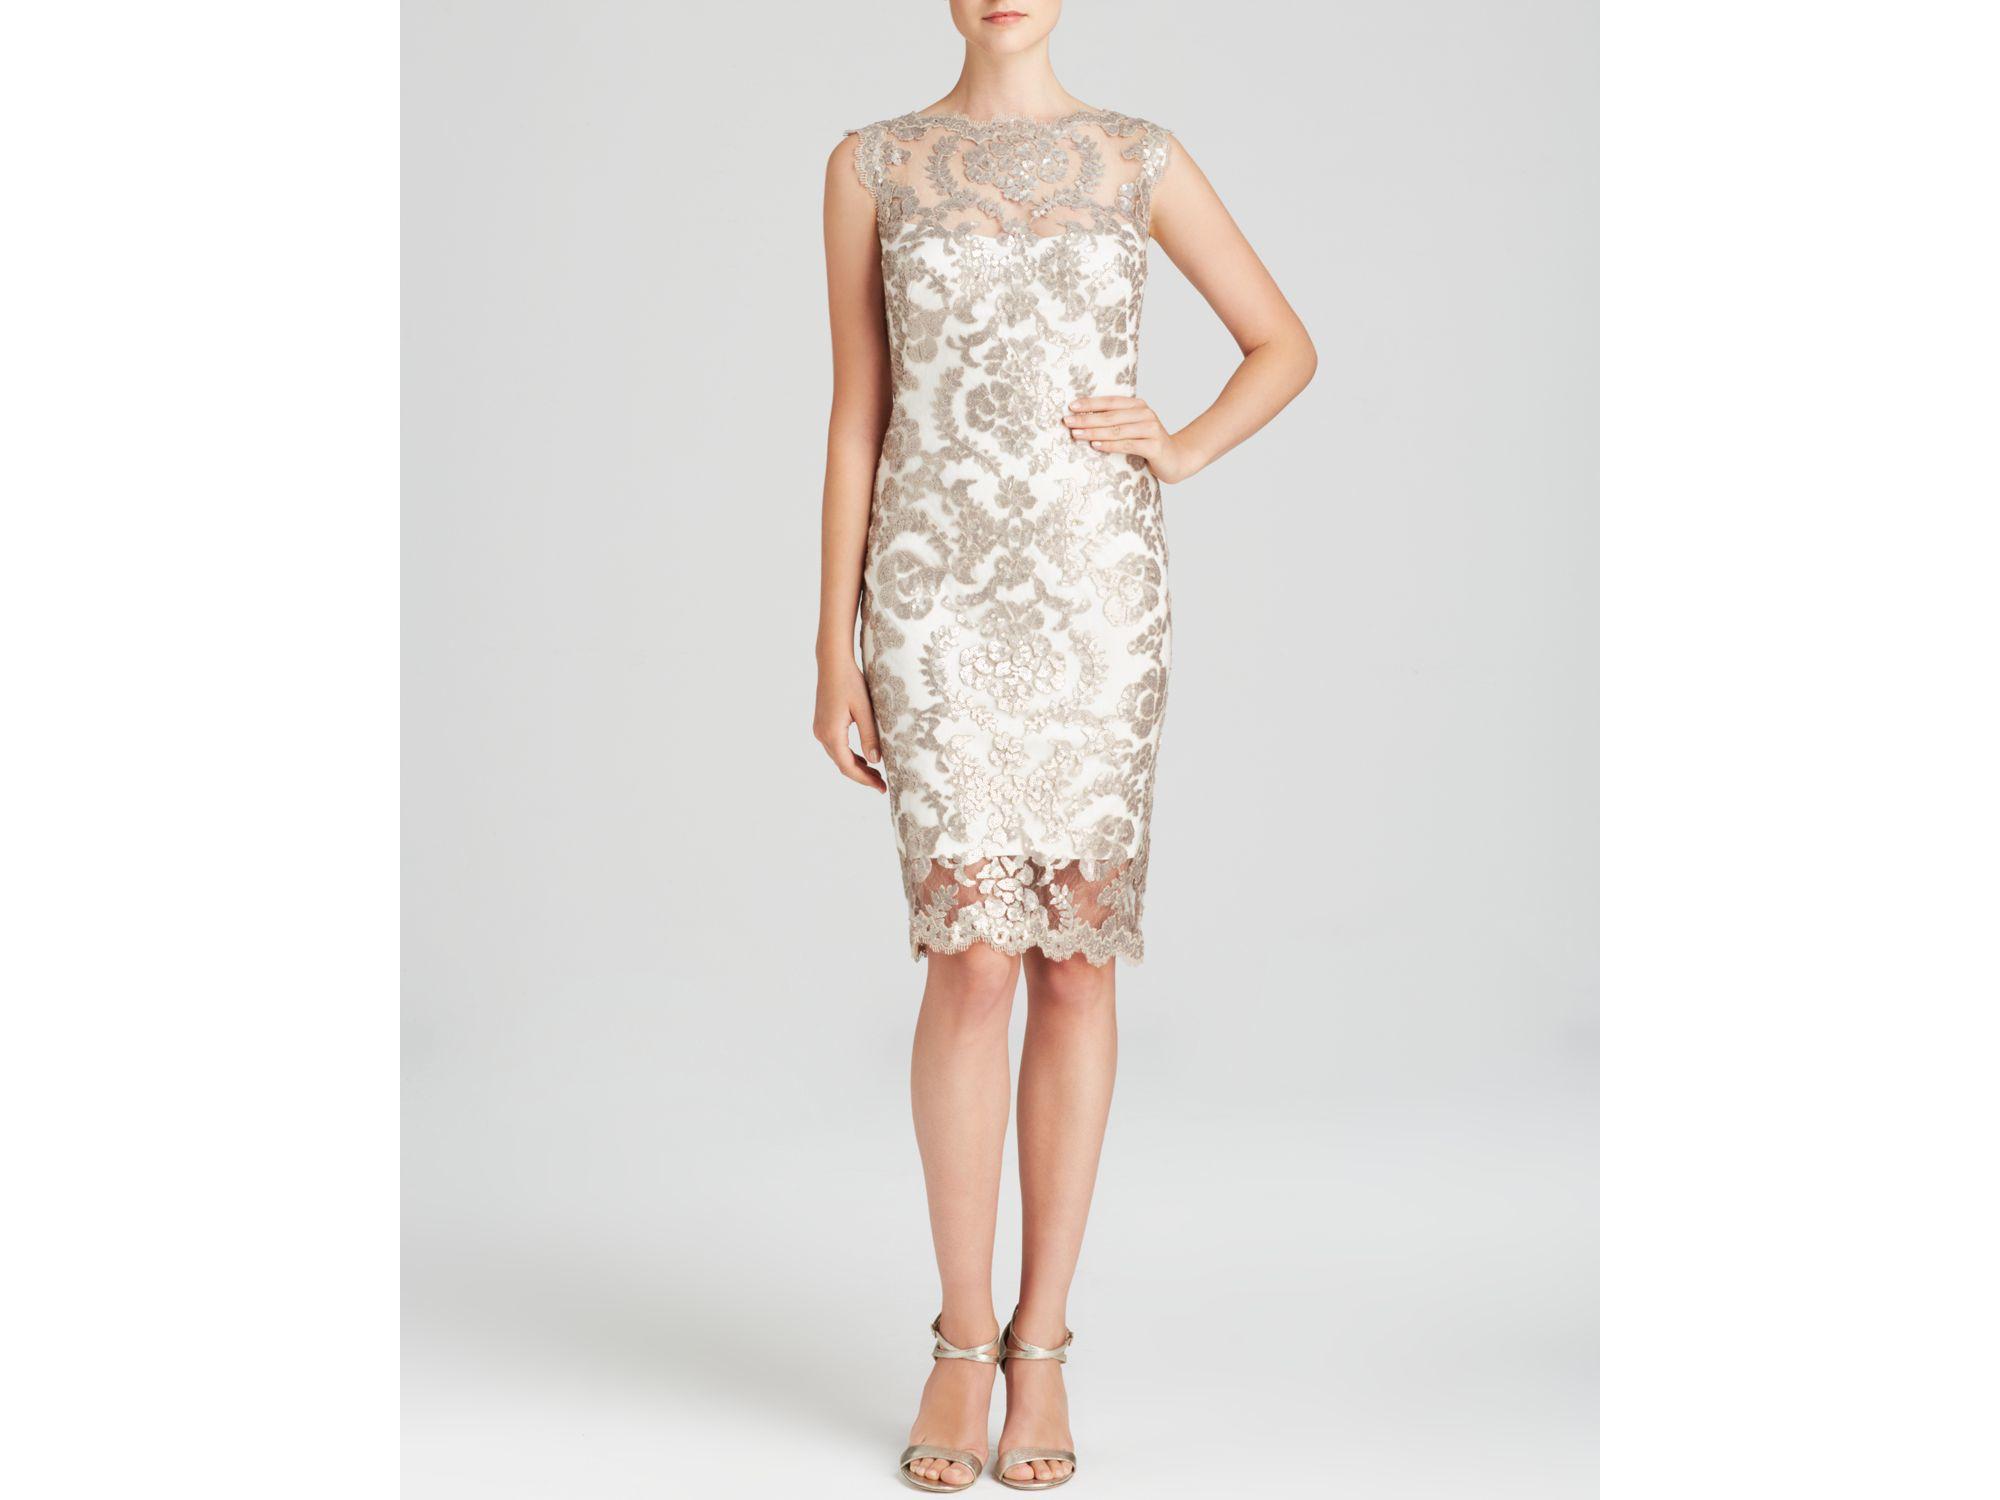 fffa3af2f80 Tadashi Shoji Dress - Sleeveless Illusion Neckline Sequin Lace ...